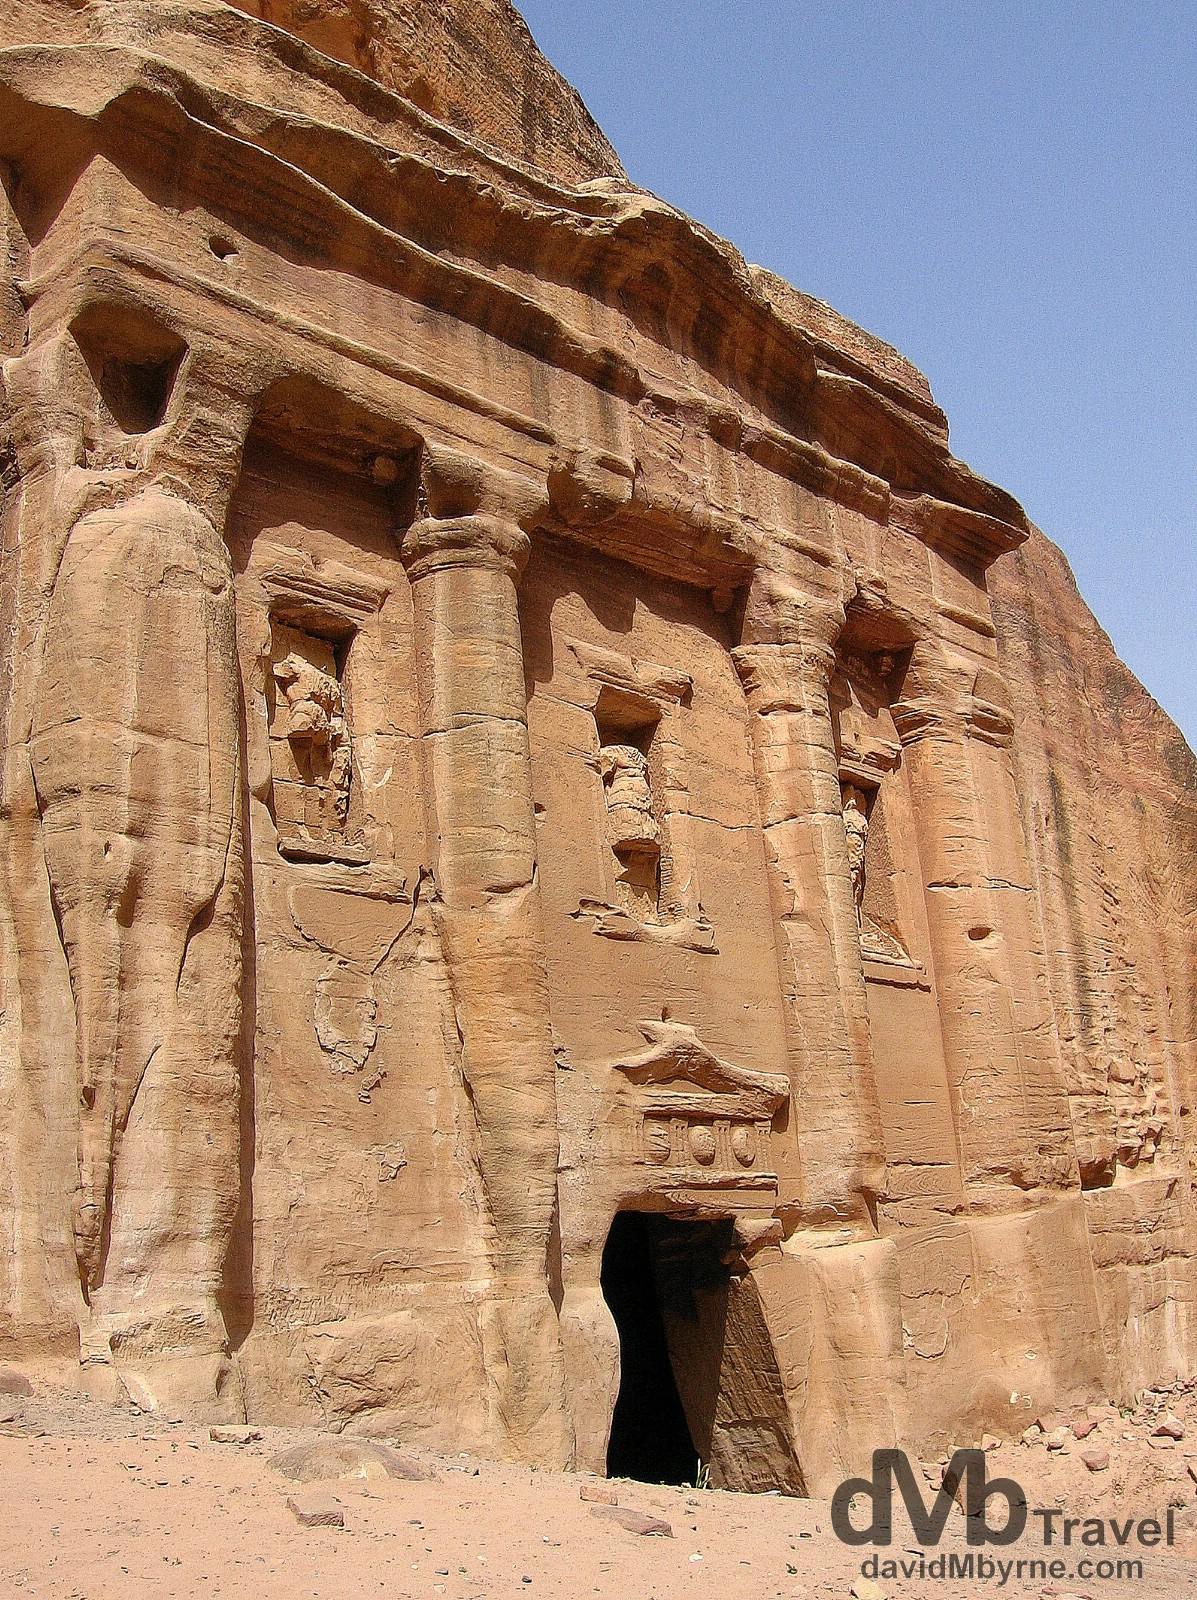 A weather-worn solid rock facade in Petra, Jordan. April 27, 2008.